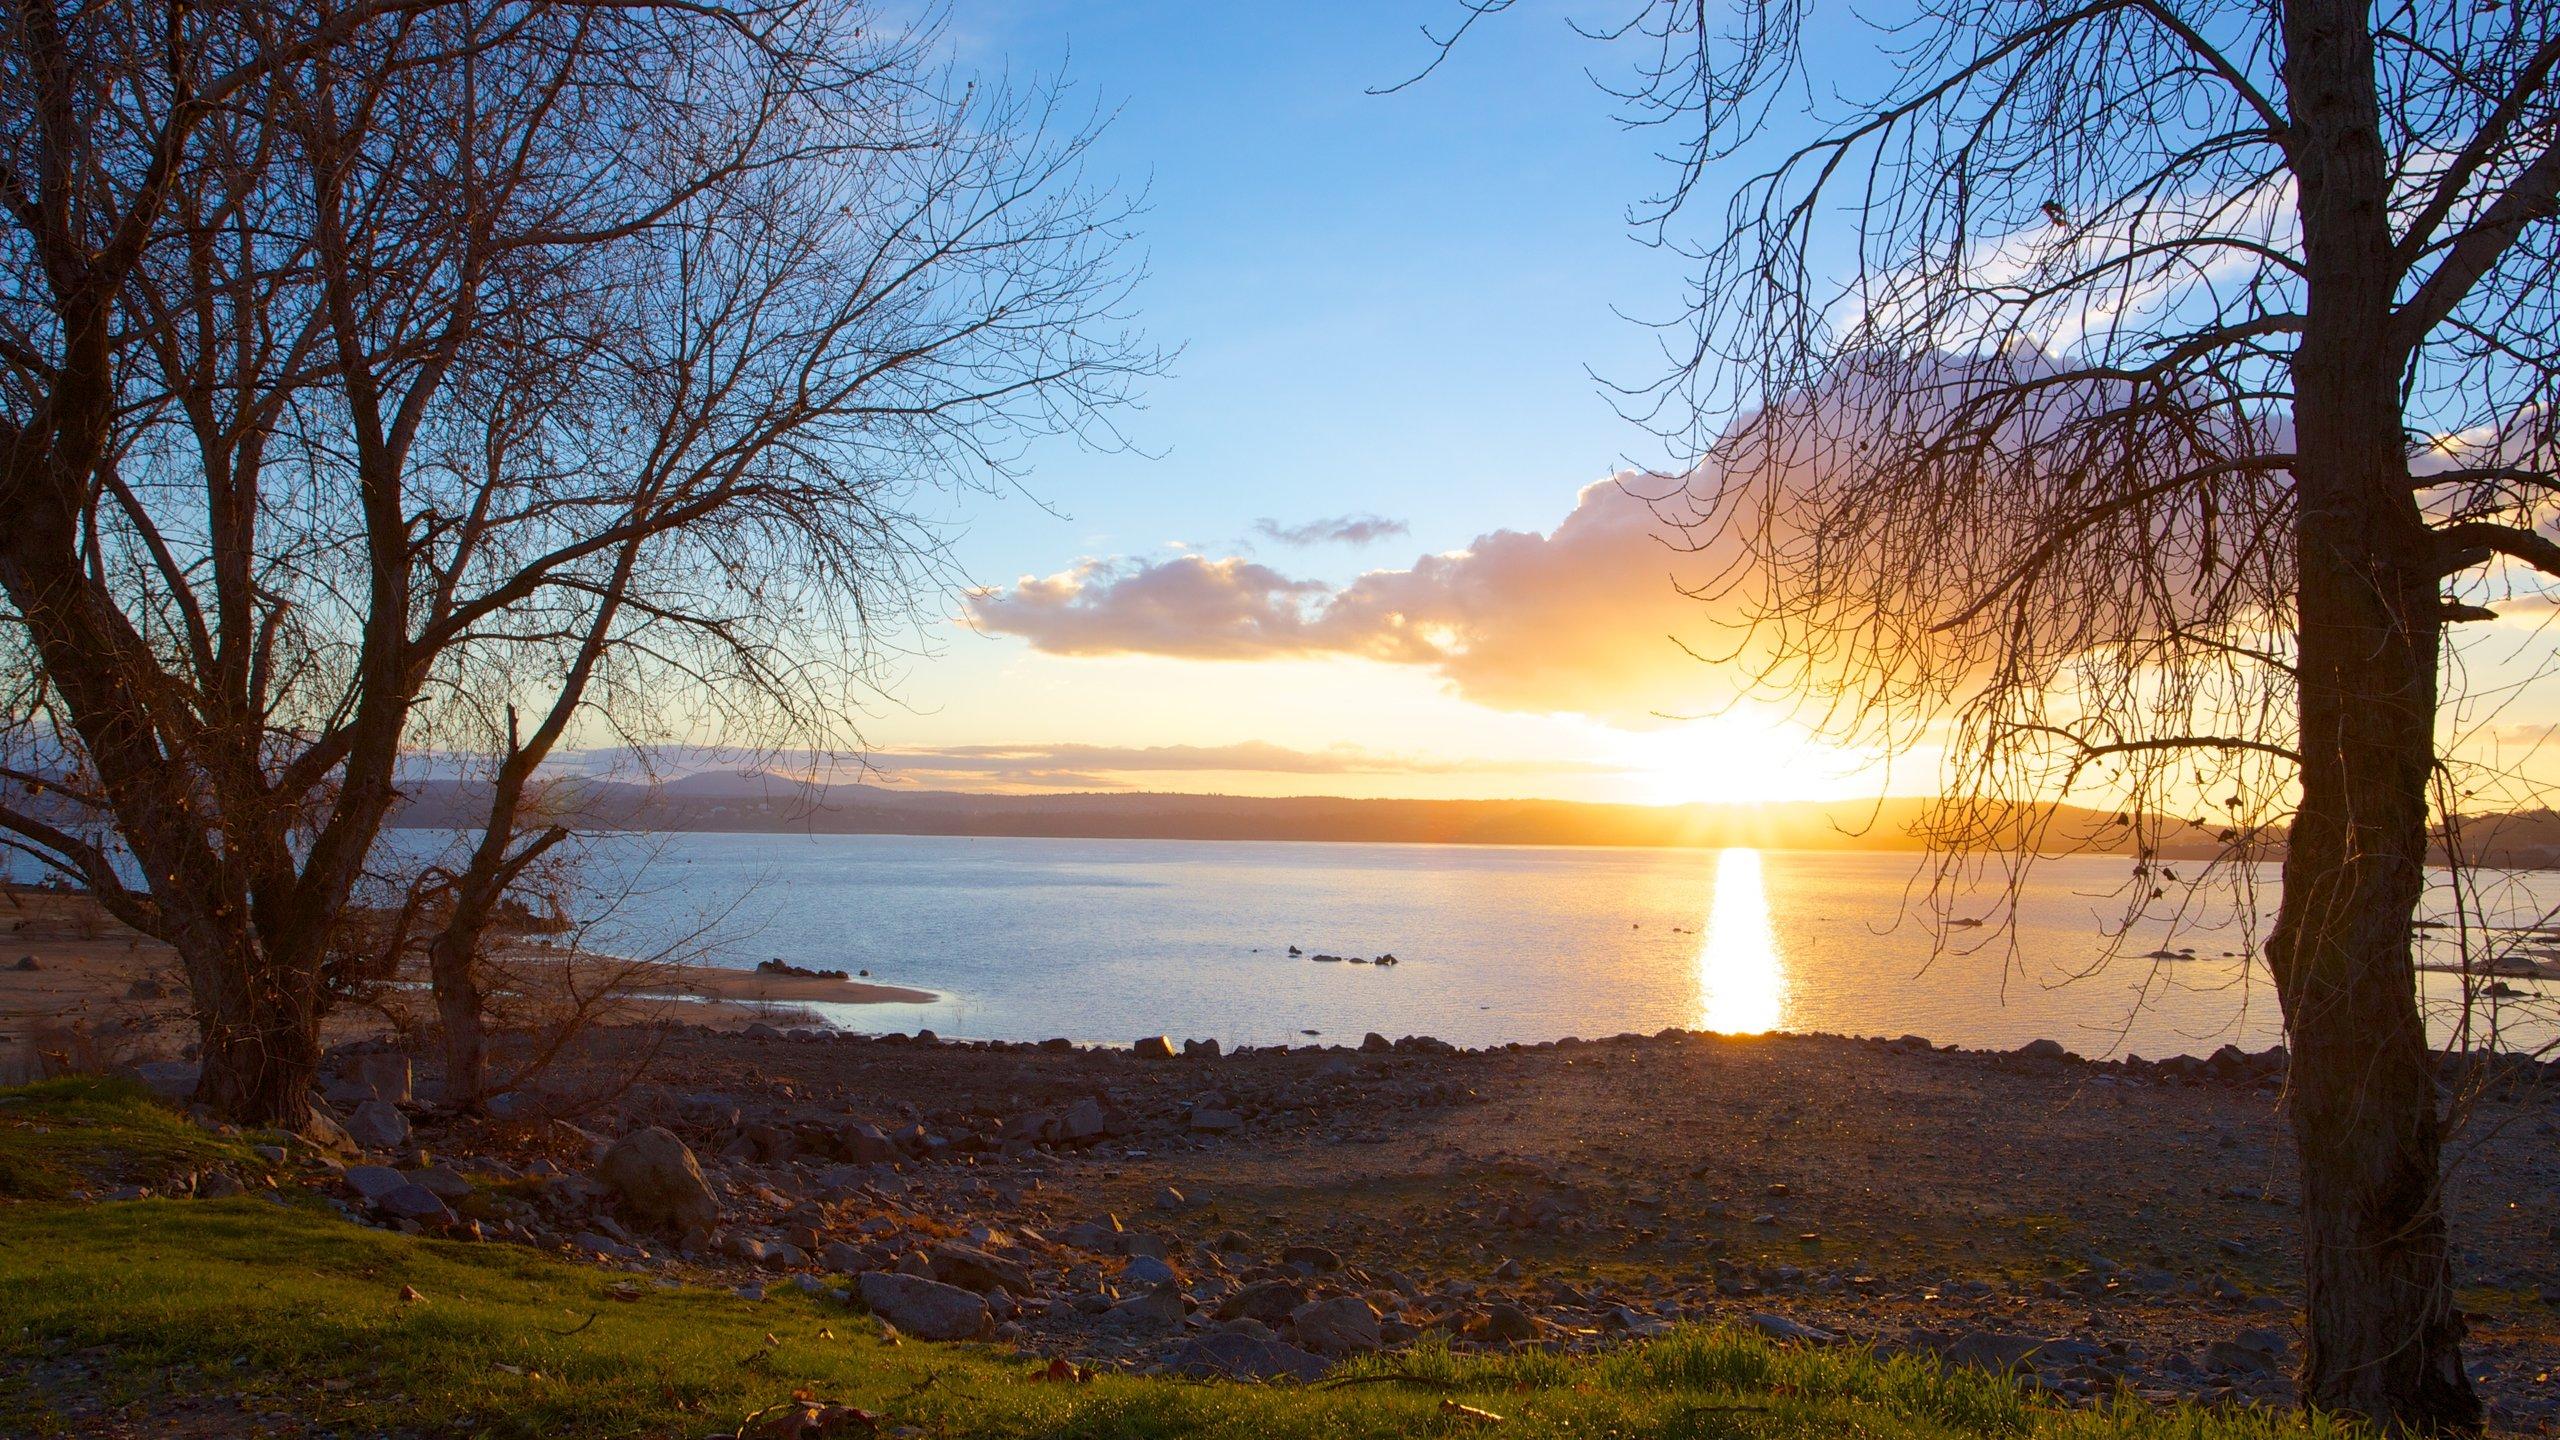 Folsom Lake State Recreation Area, California, United States of America